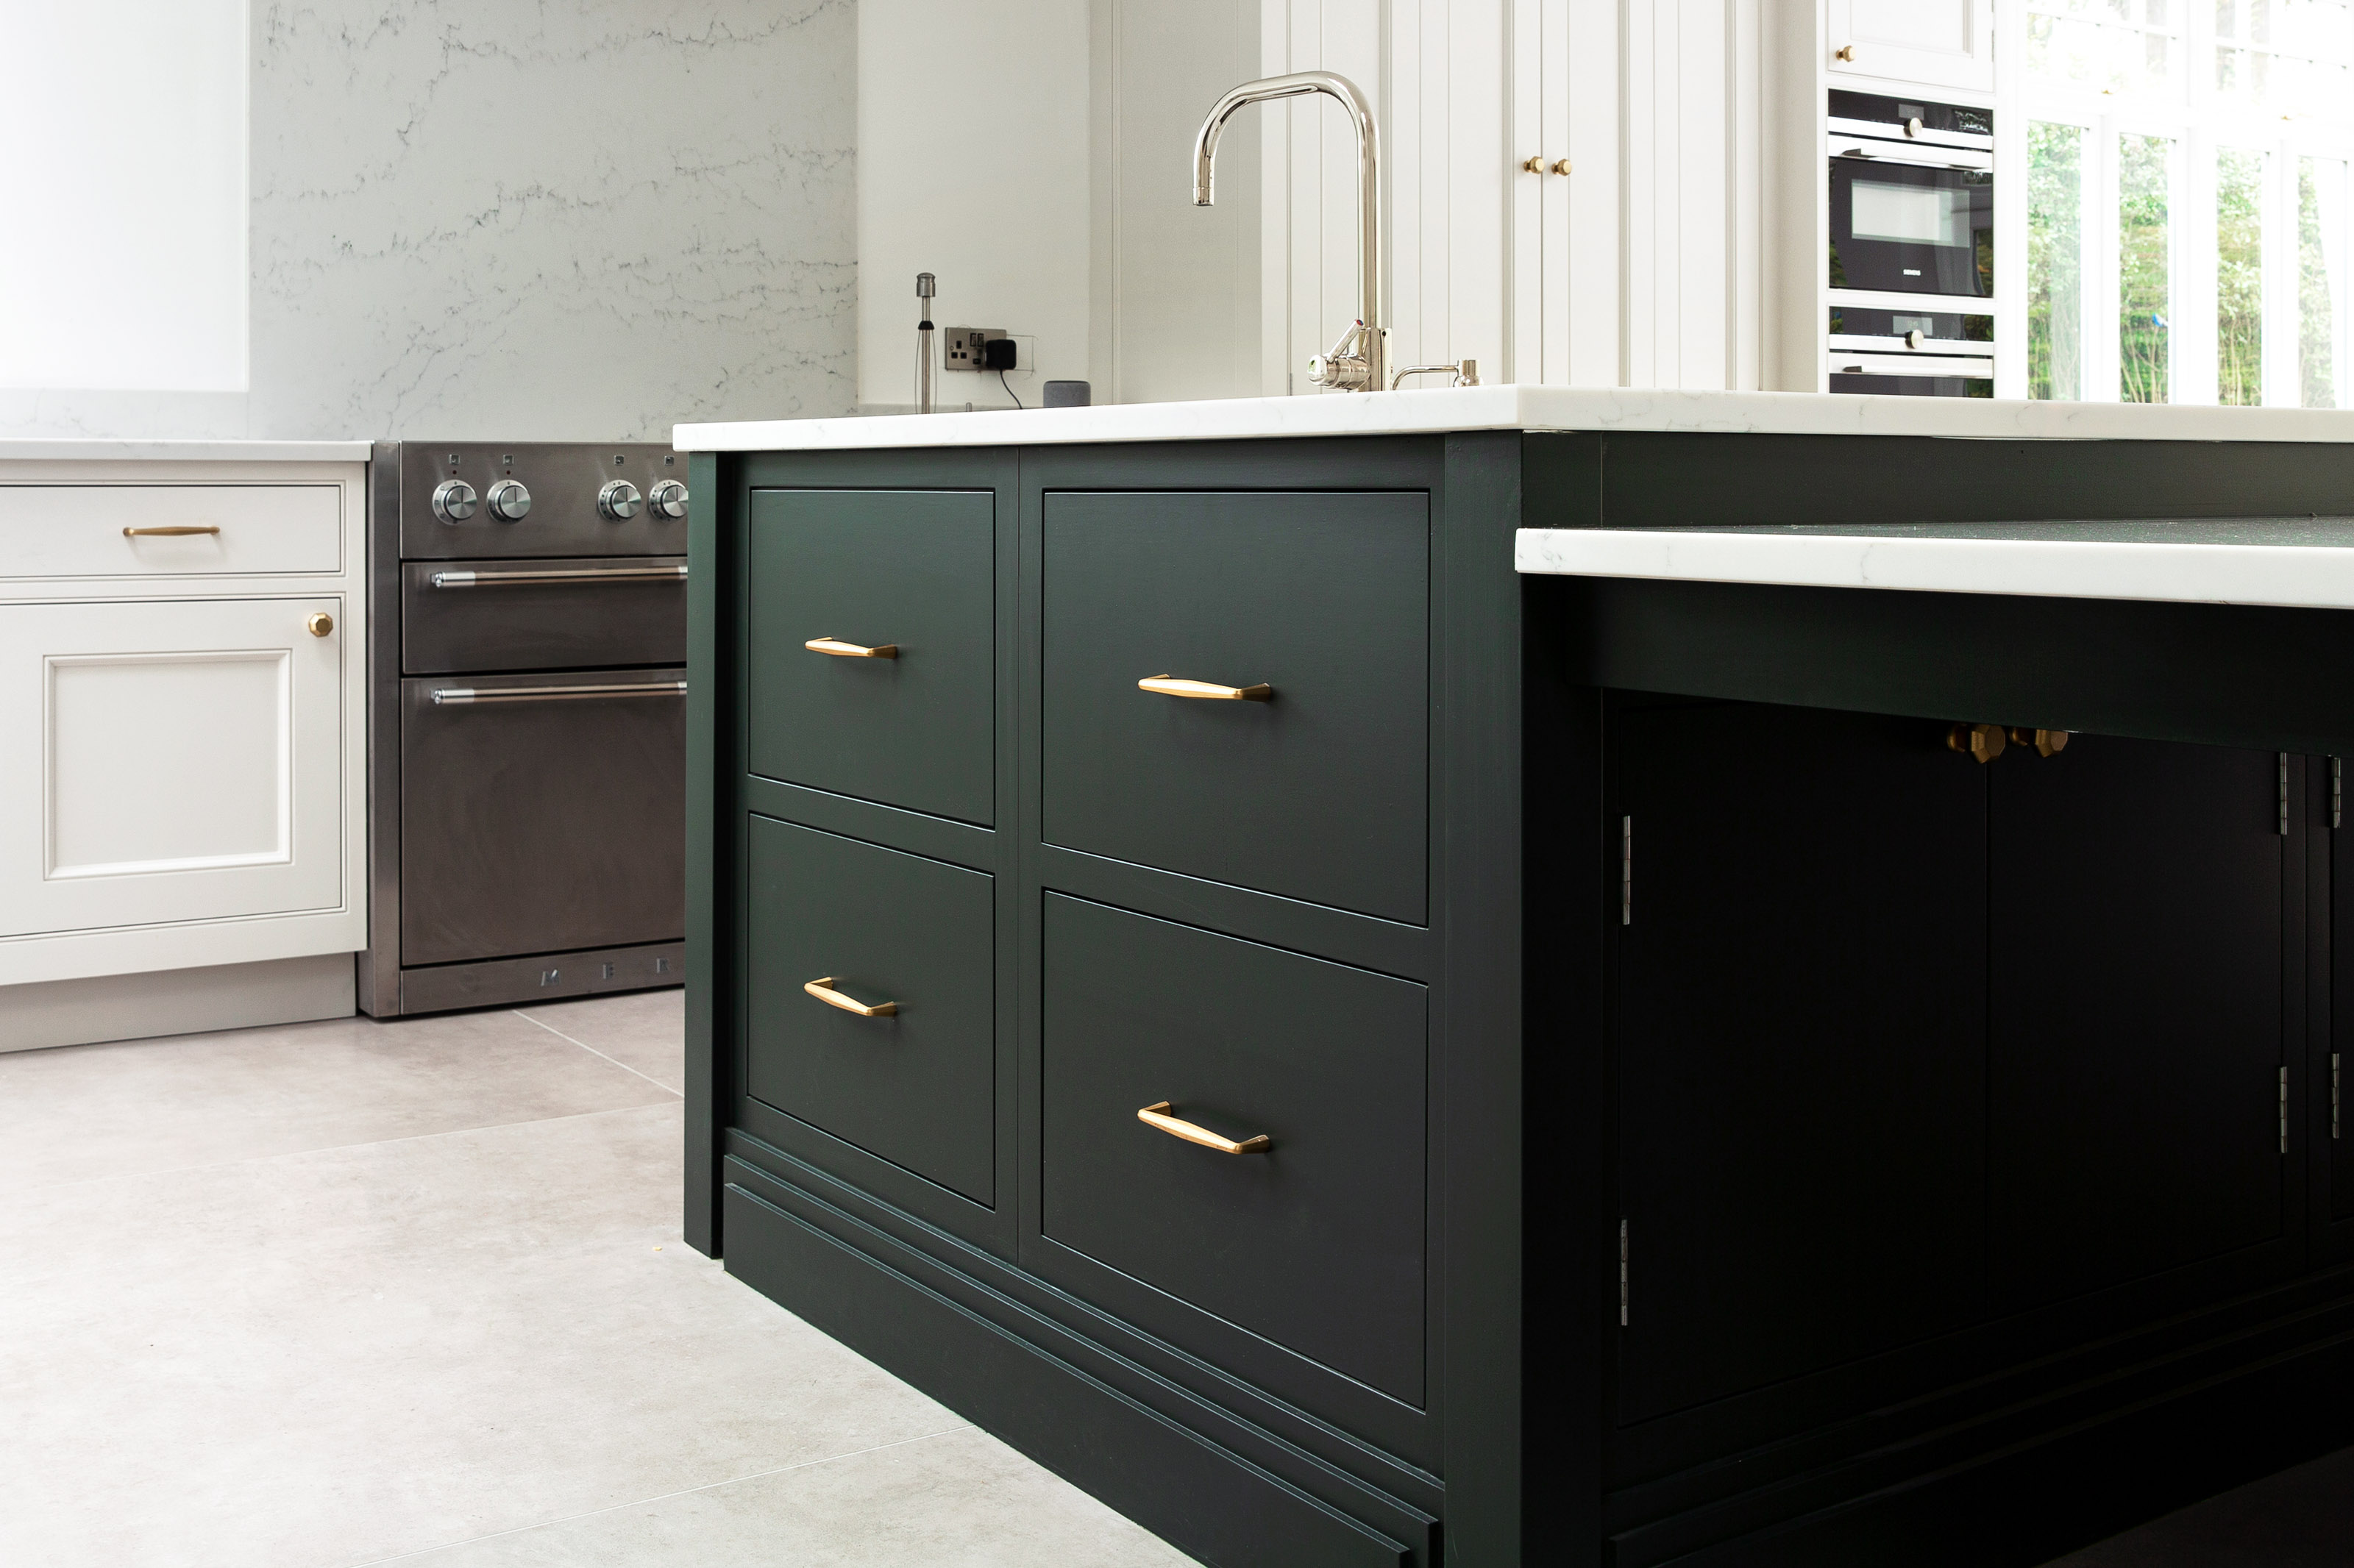 Watsons_Kitchens_Harrogate-11-2